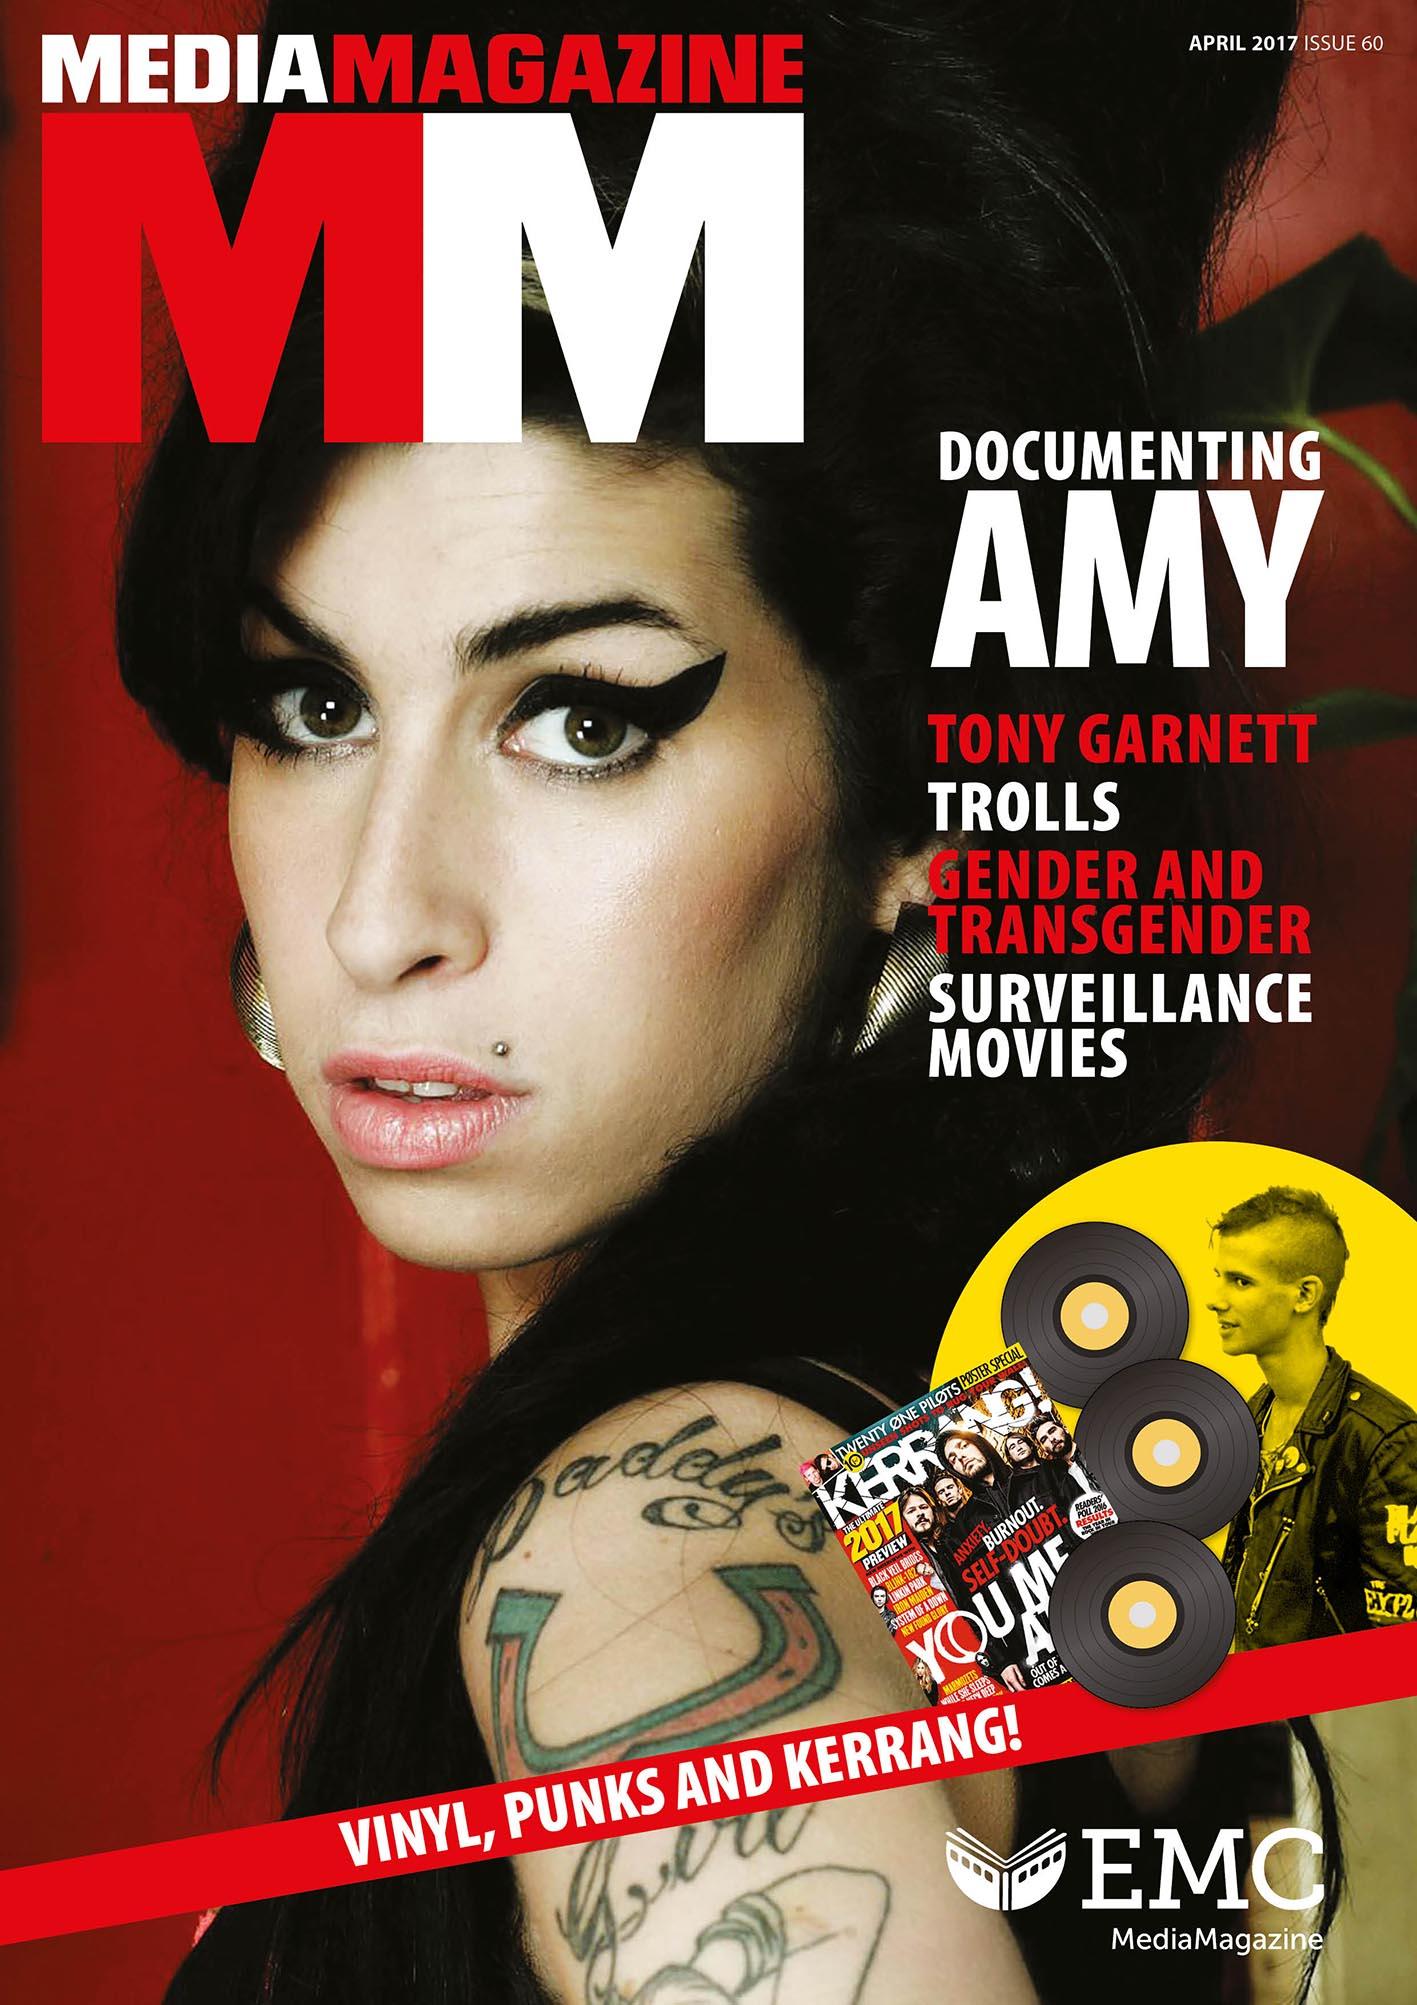 MediaMagazine 60 front cover